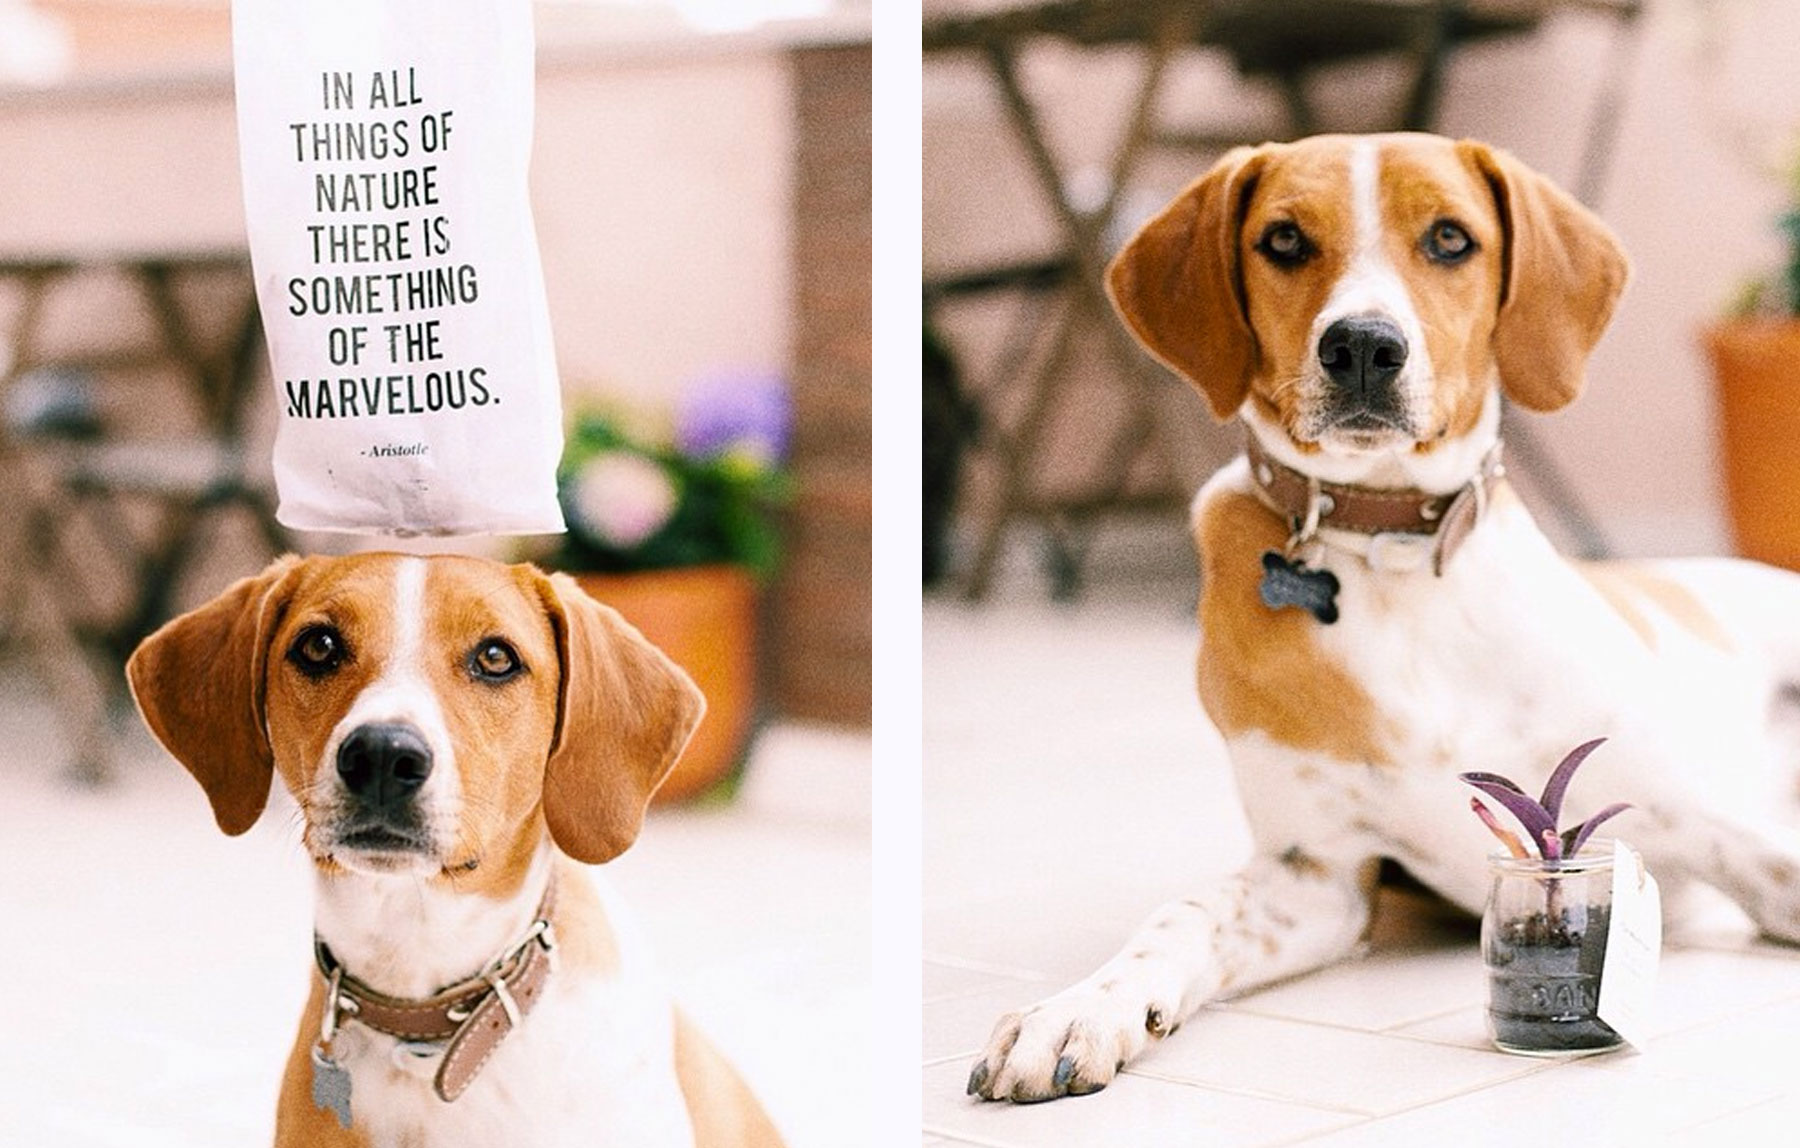 publicacion giving nature perro planta mensaje